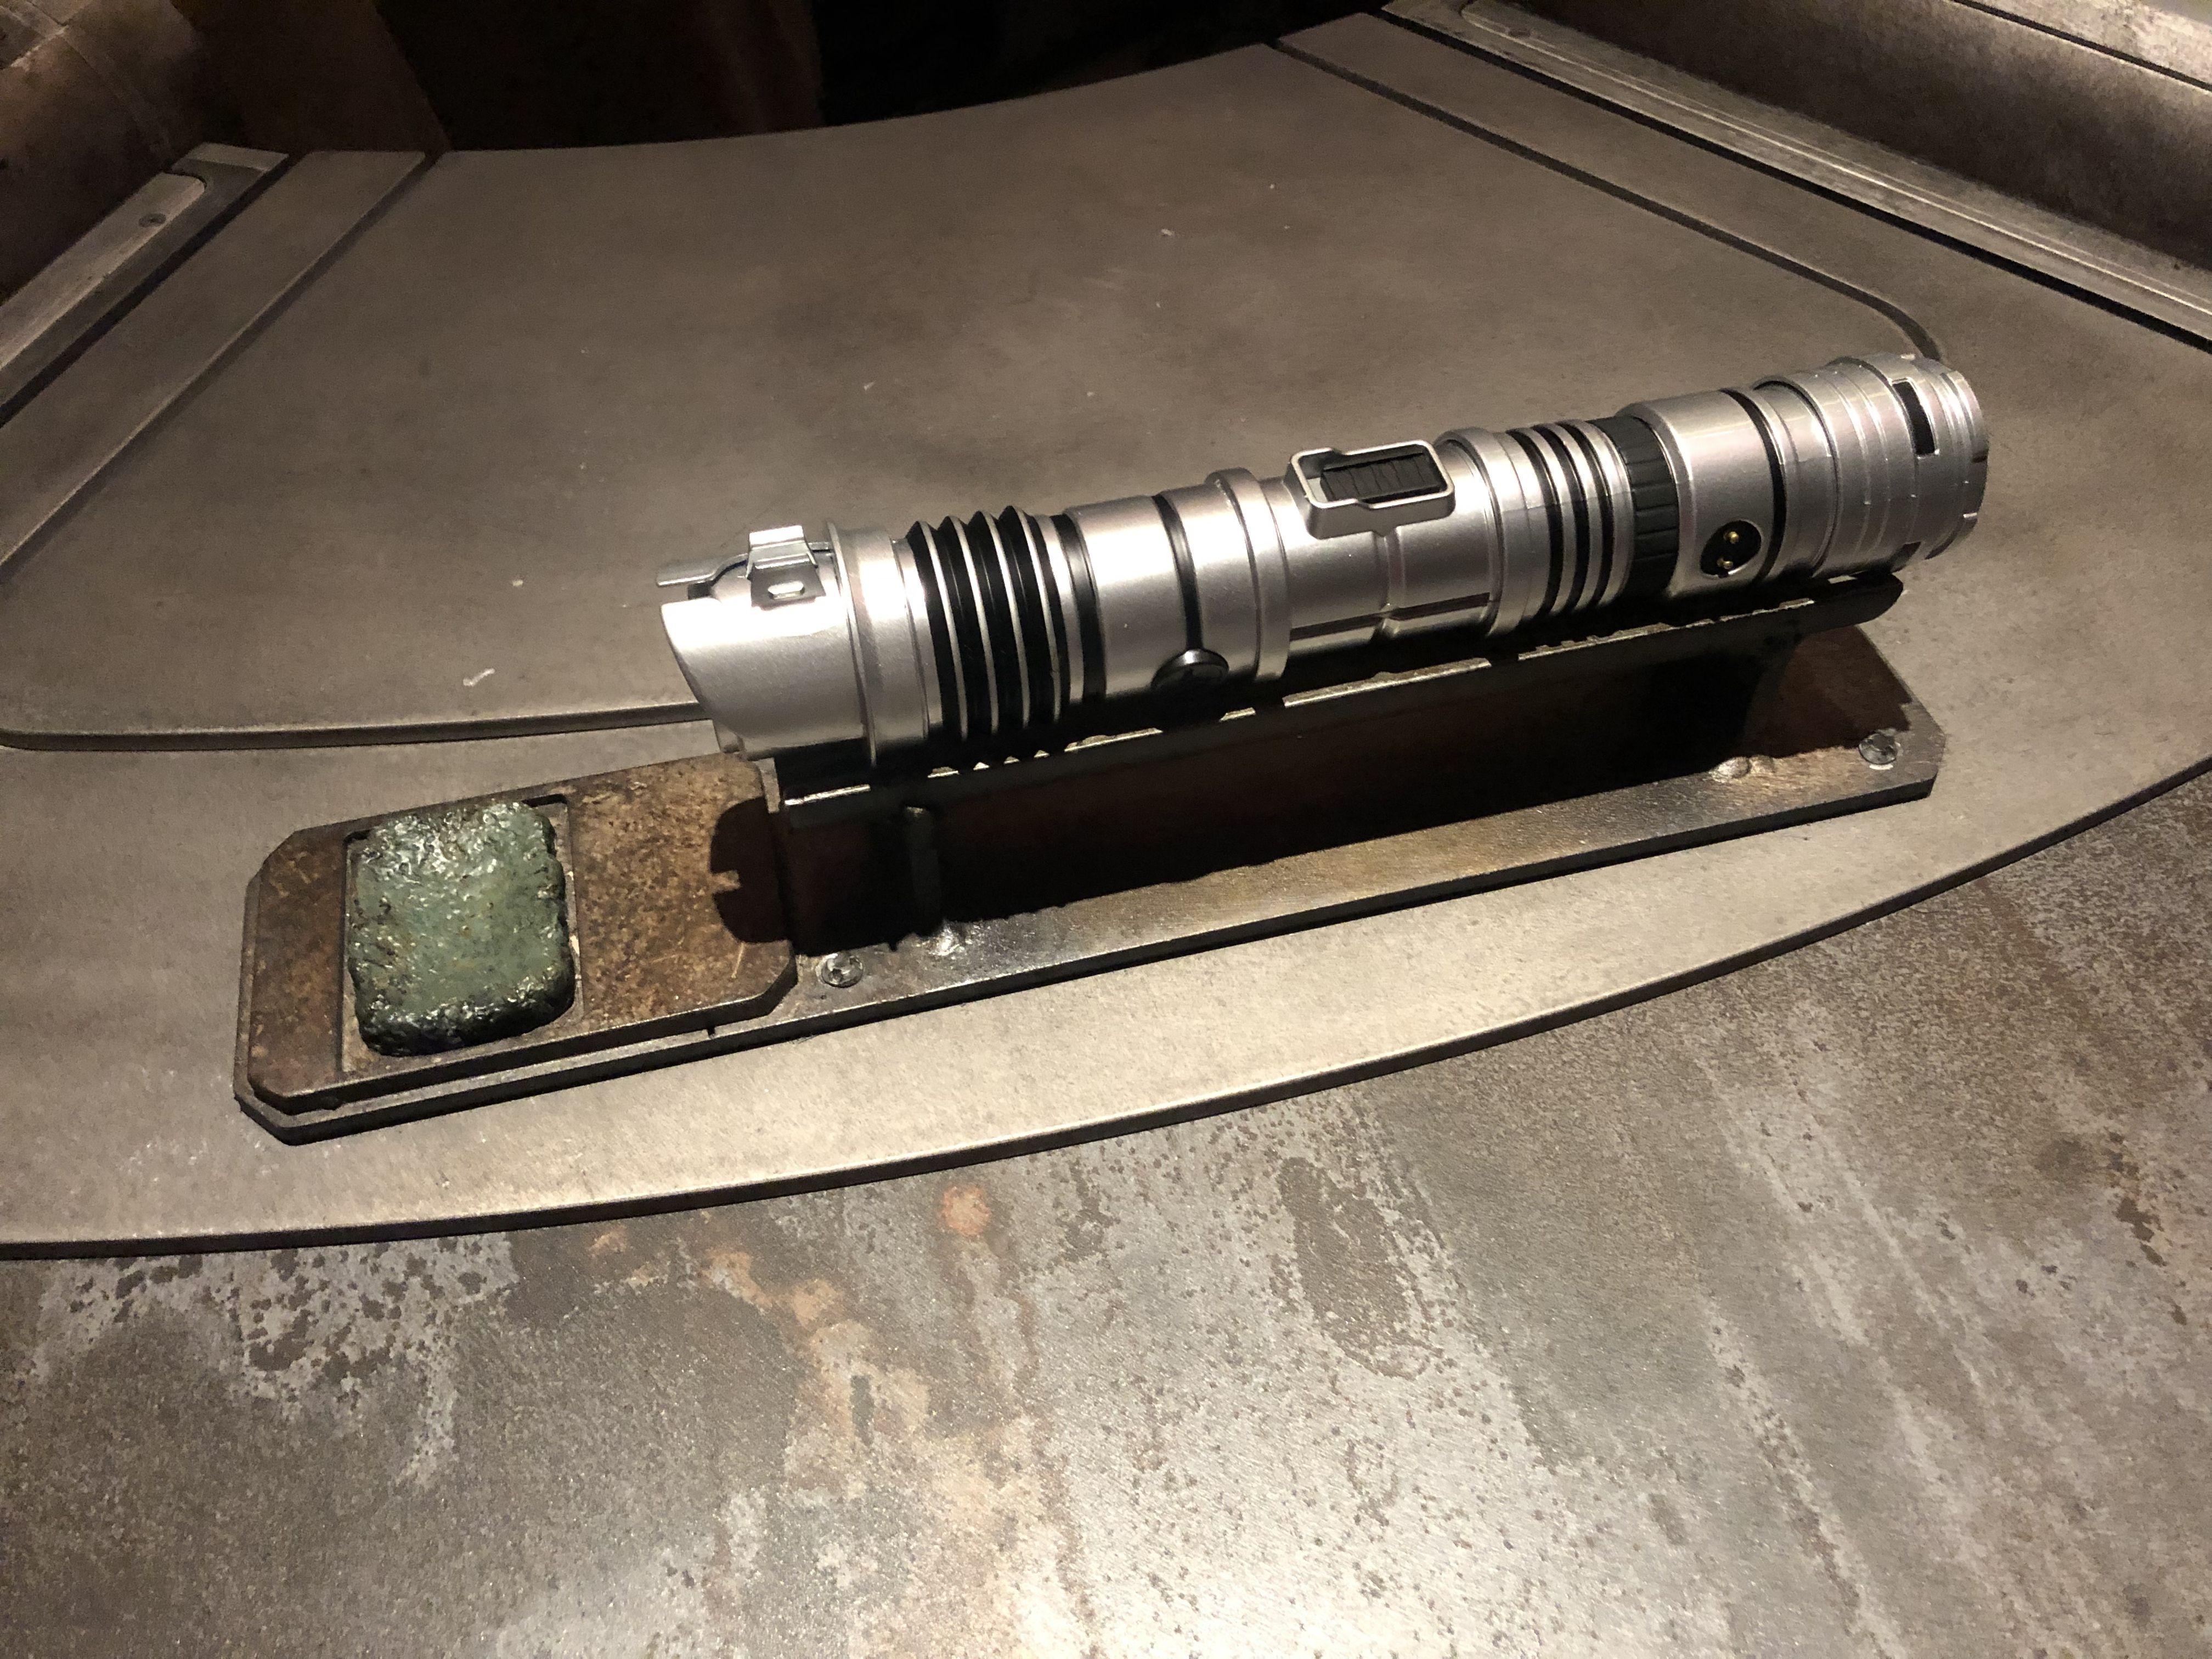 Disney Star Wars Vacuum Home Appliances